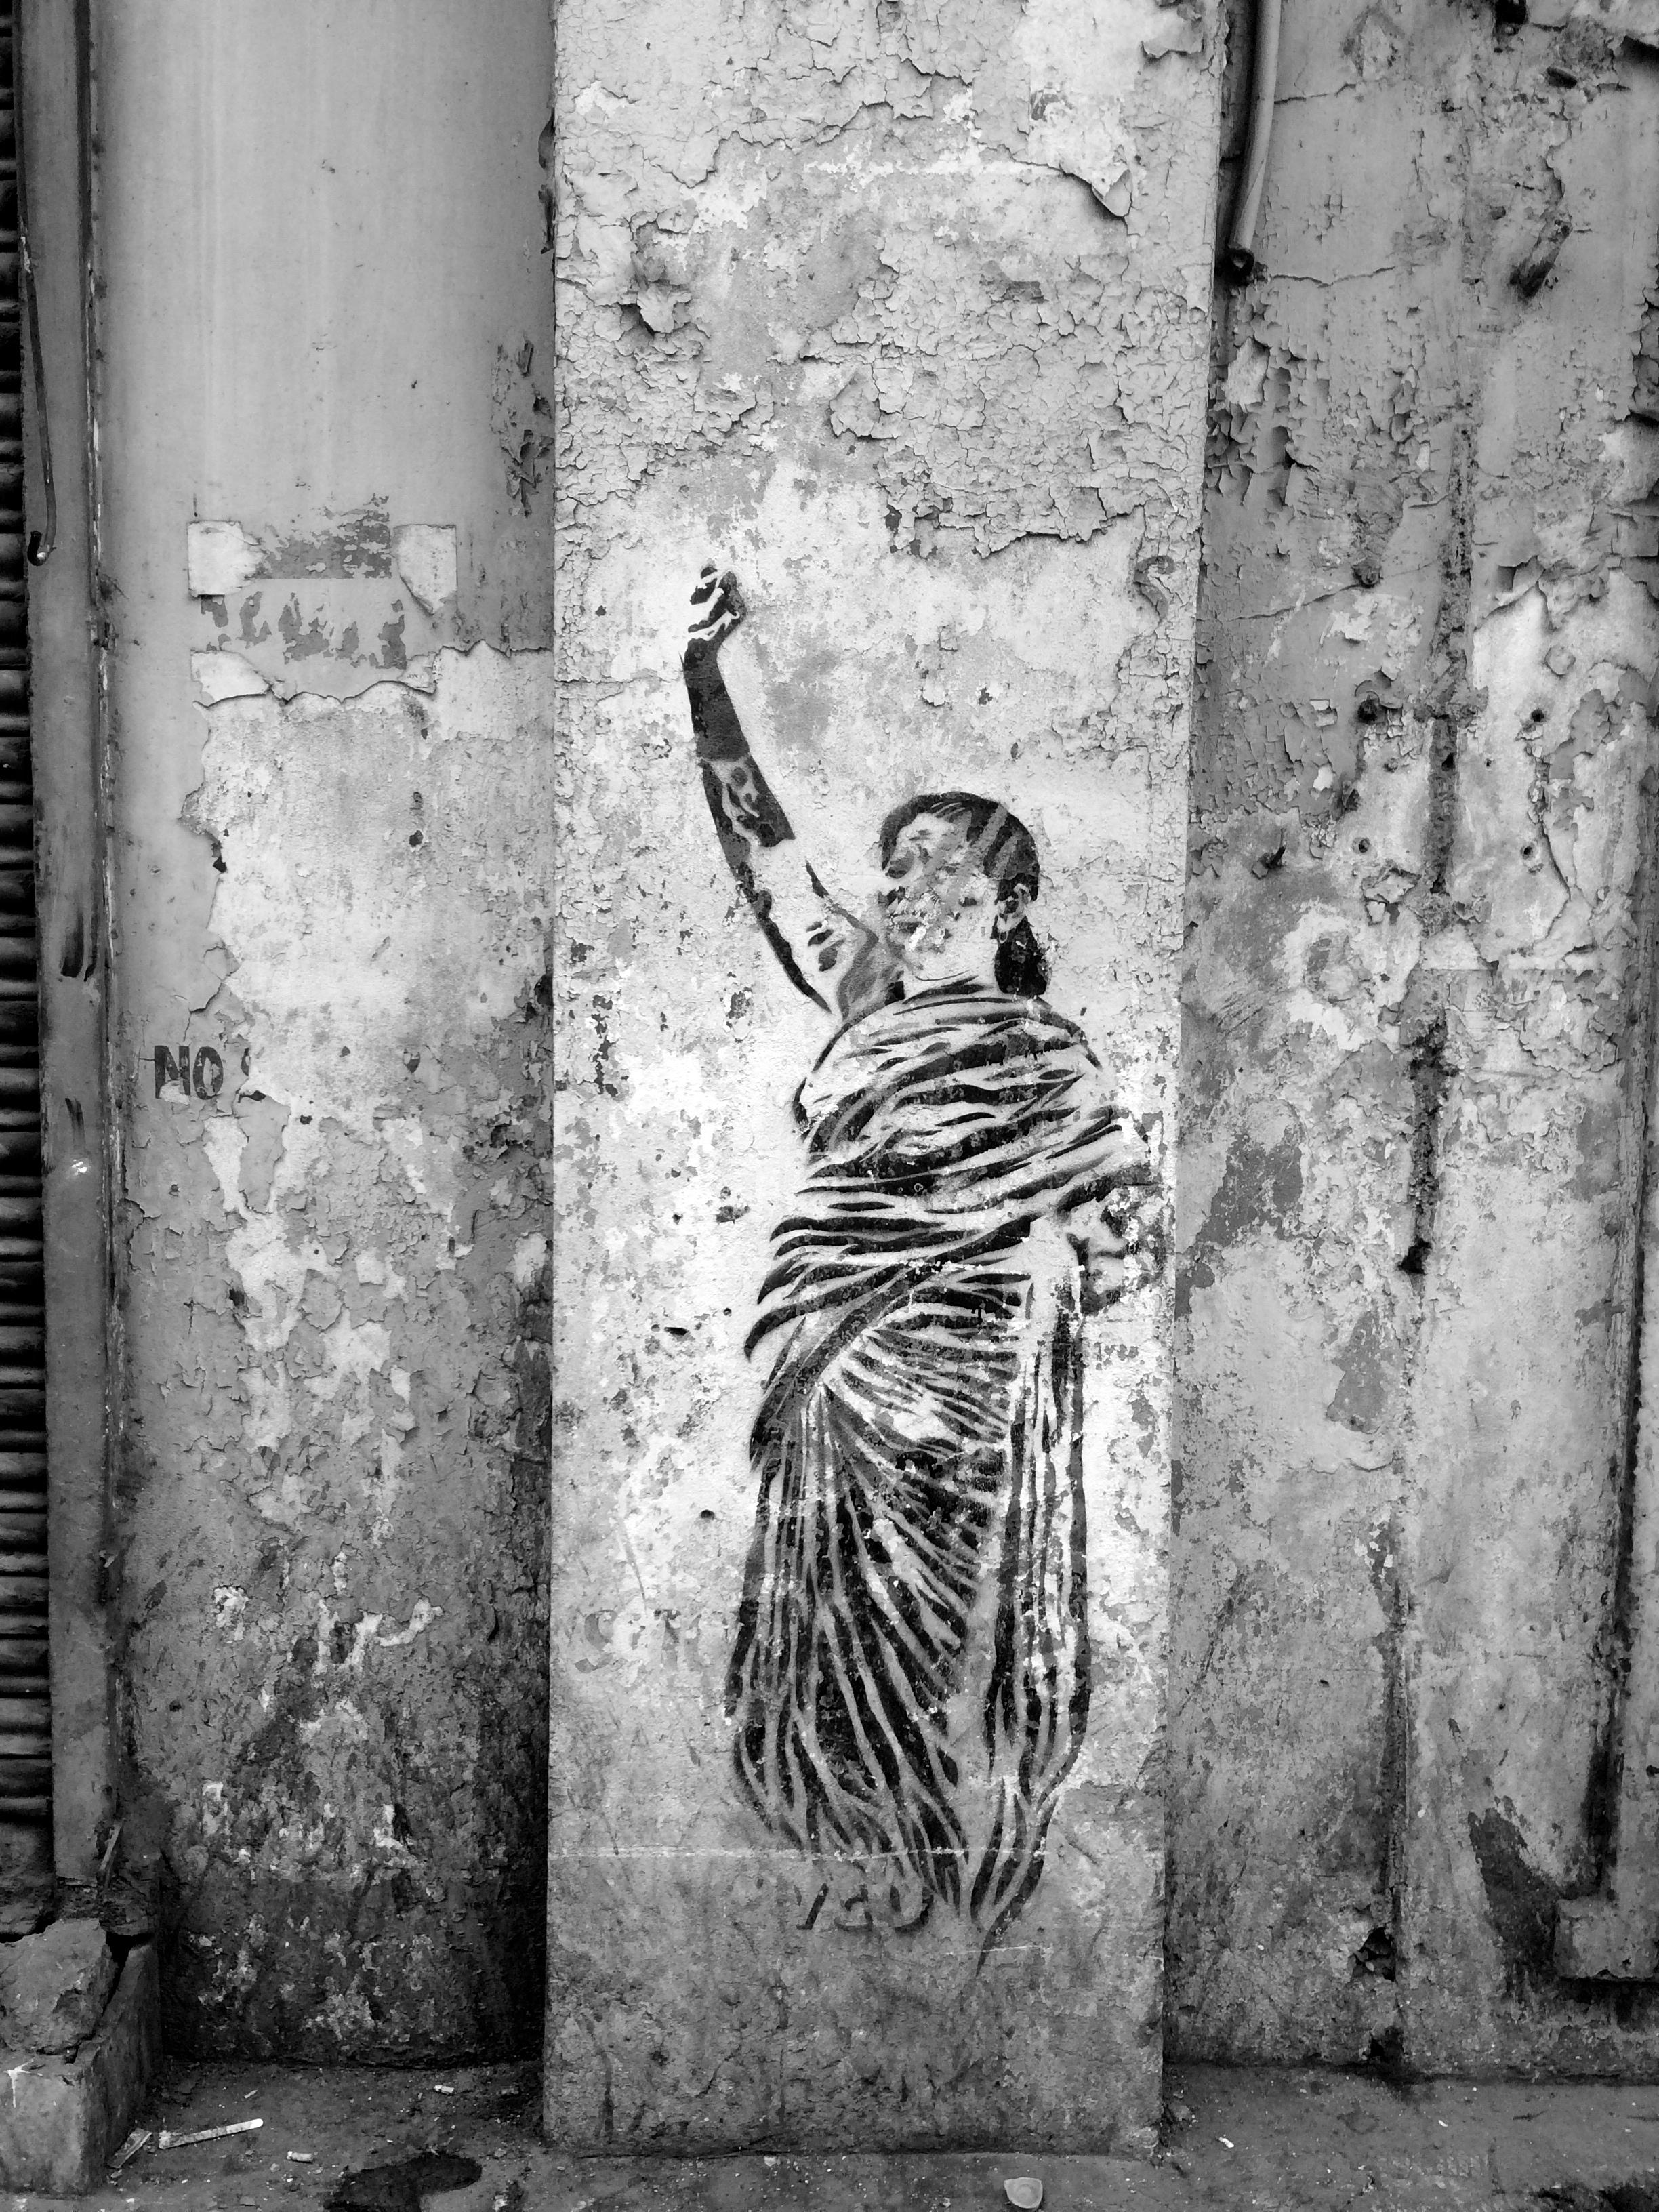 Park Street stencil street art